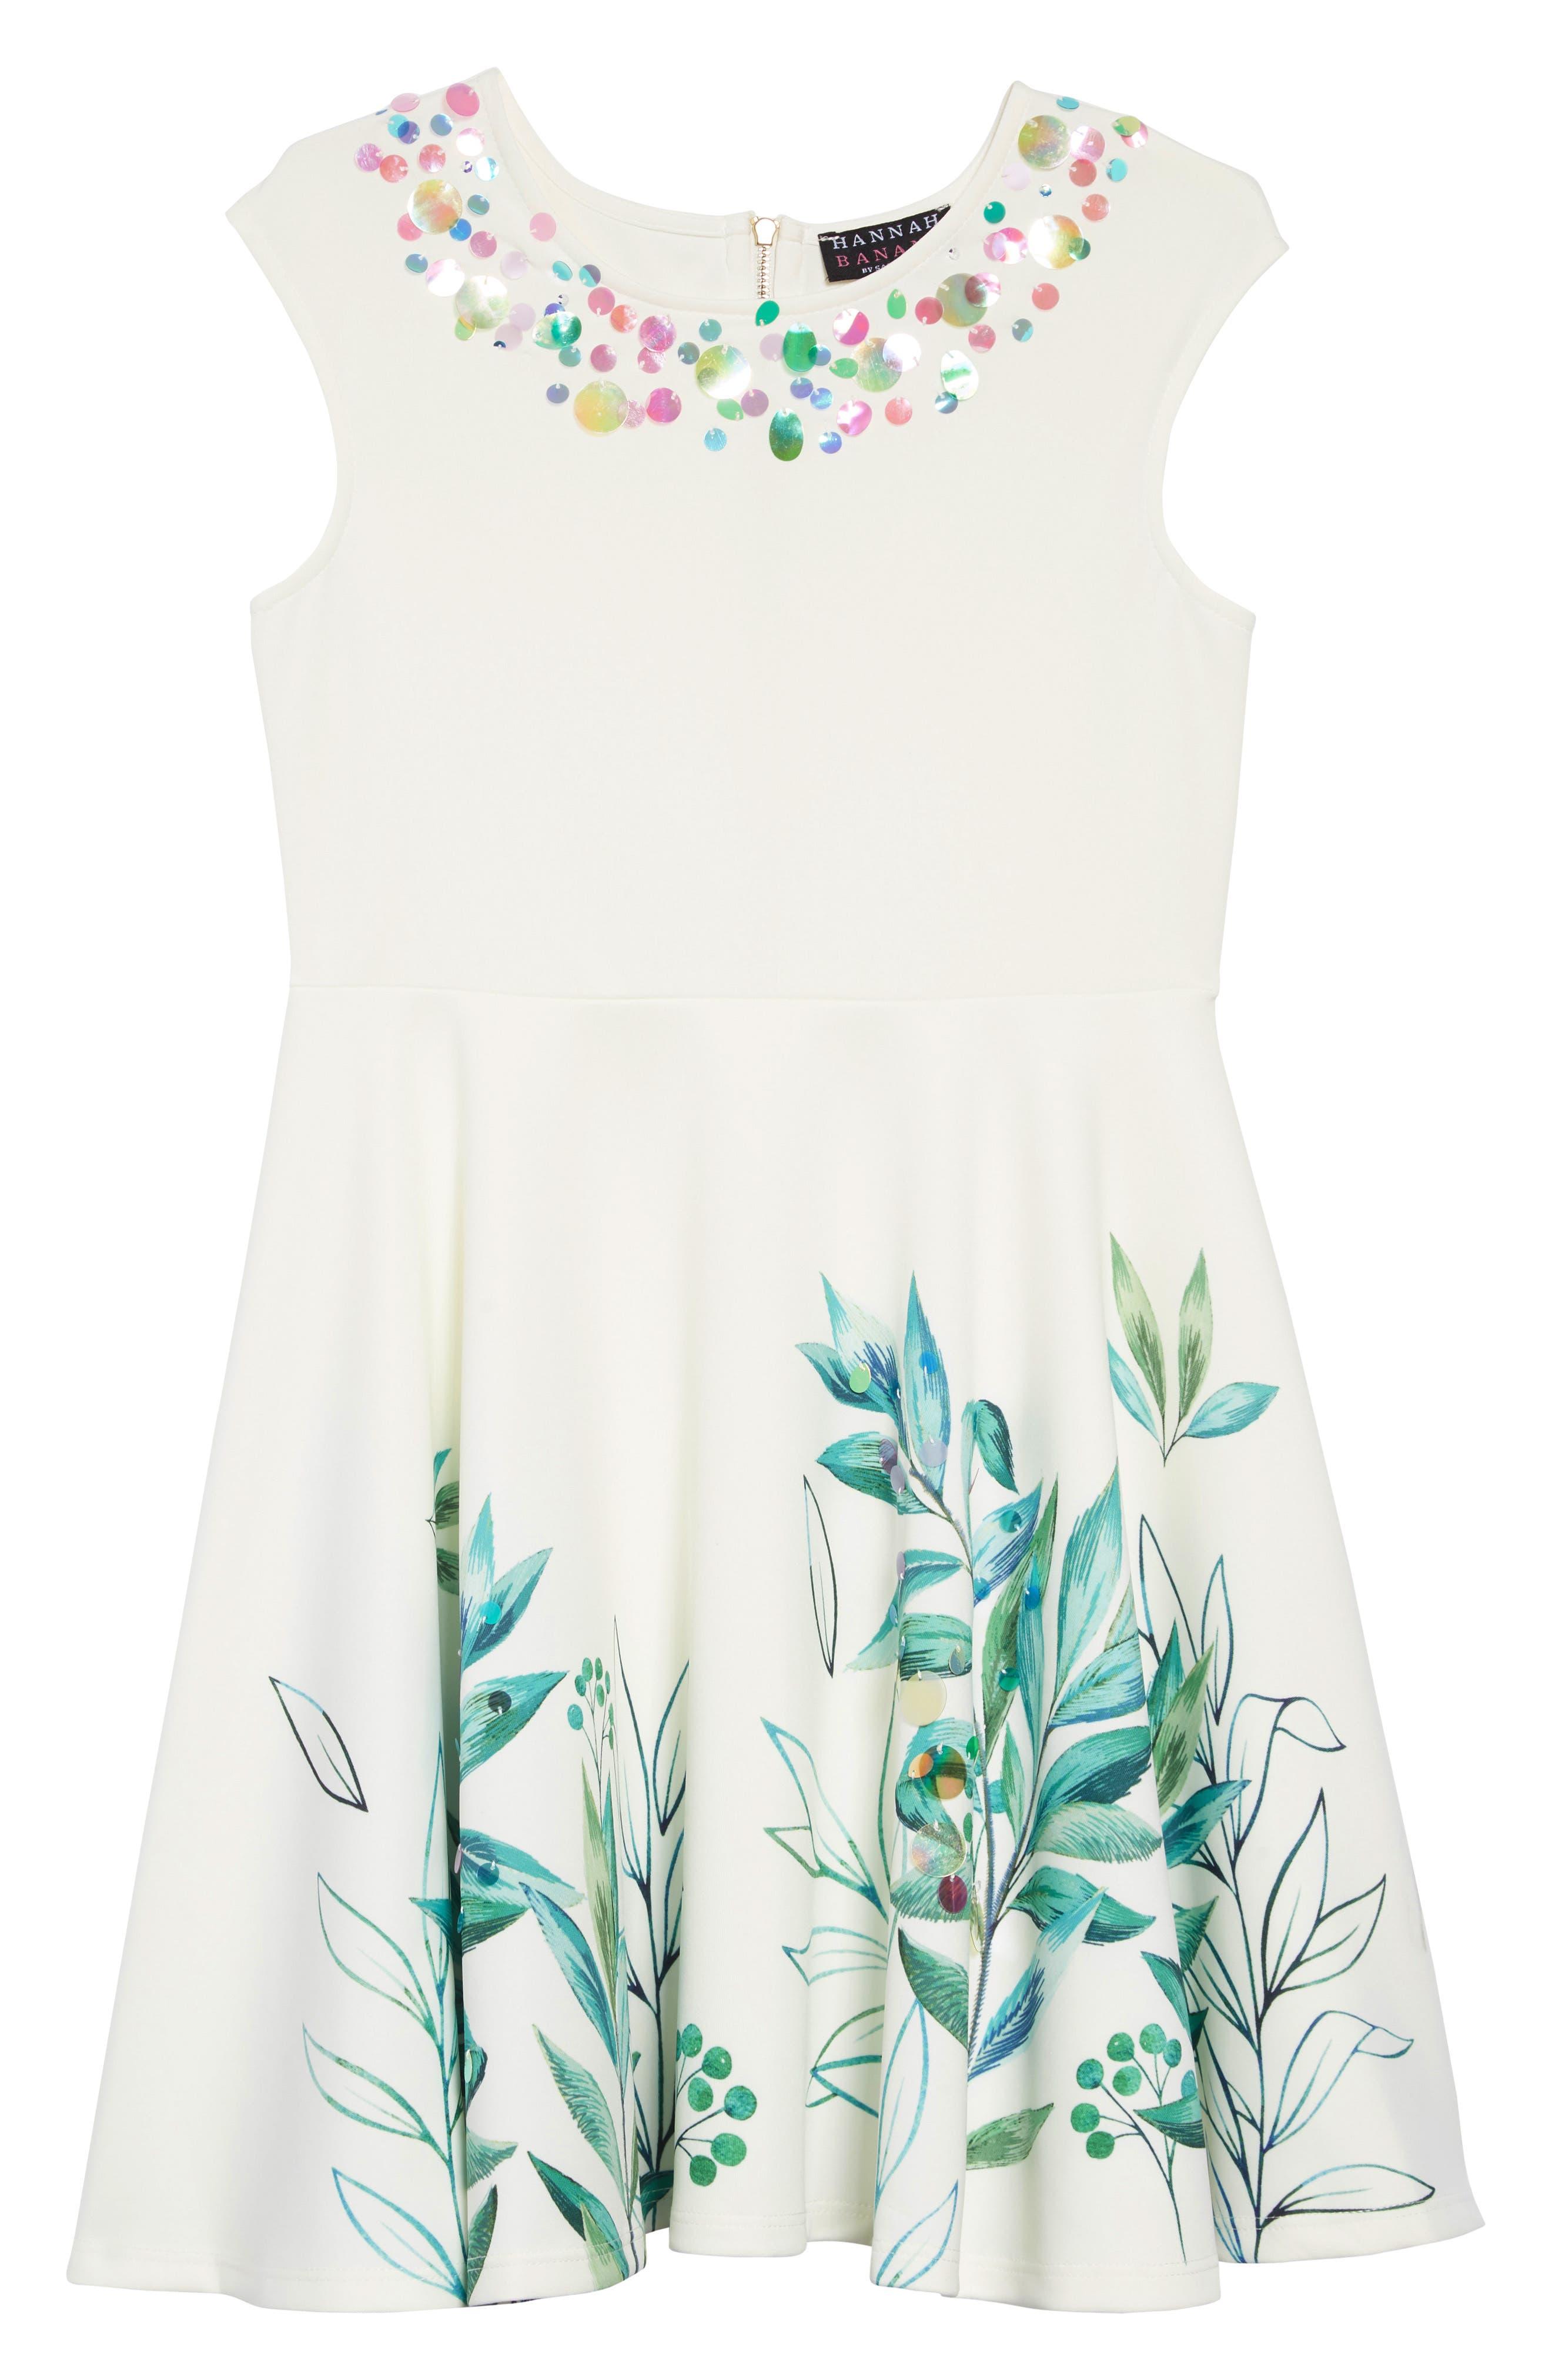 HANNAH BANANA Leafy Print Embellished Dress, Main, color, 100